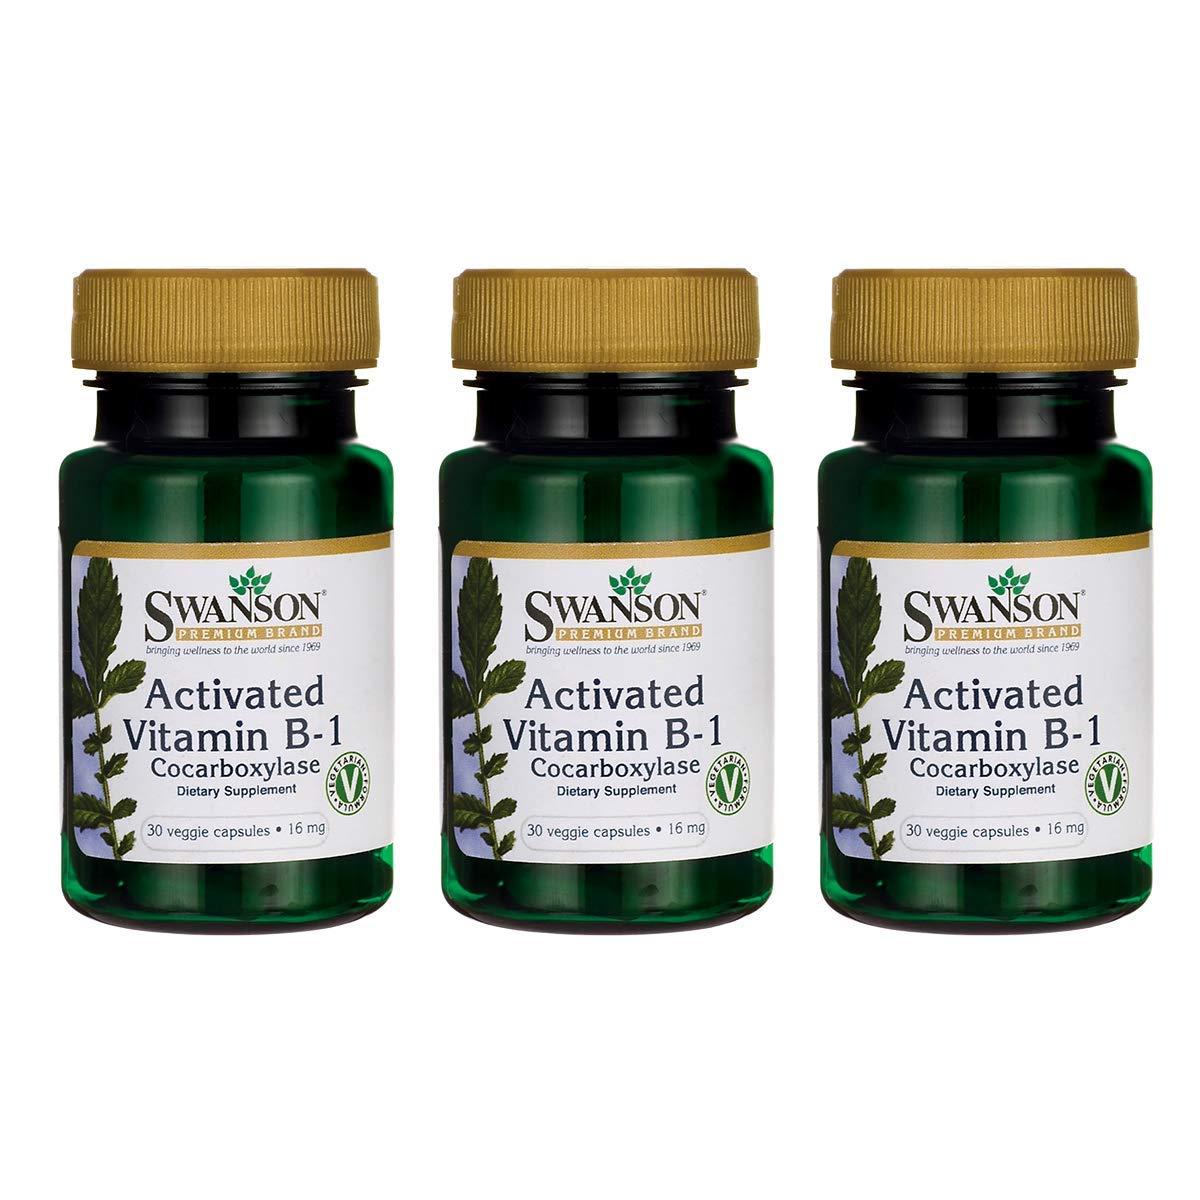 Swanson Activated Vitamin B-1 16 Milligrams 30 Veg Capsules (3 Pack)